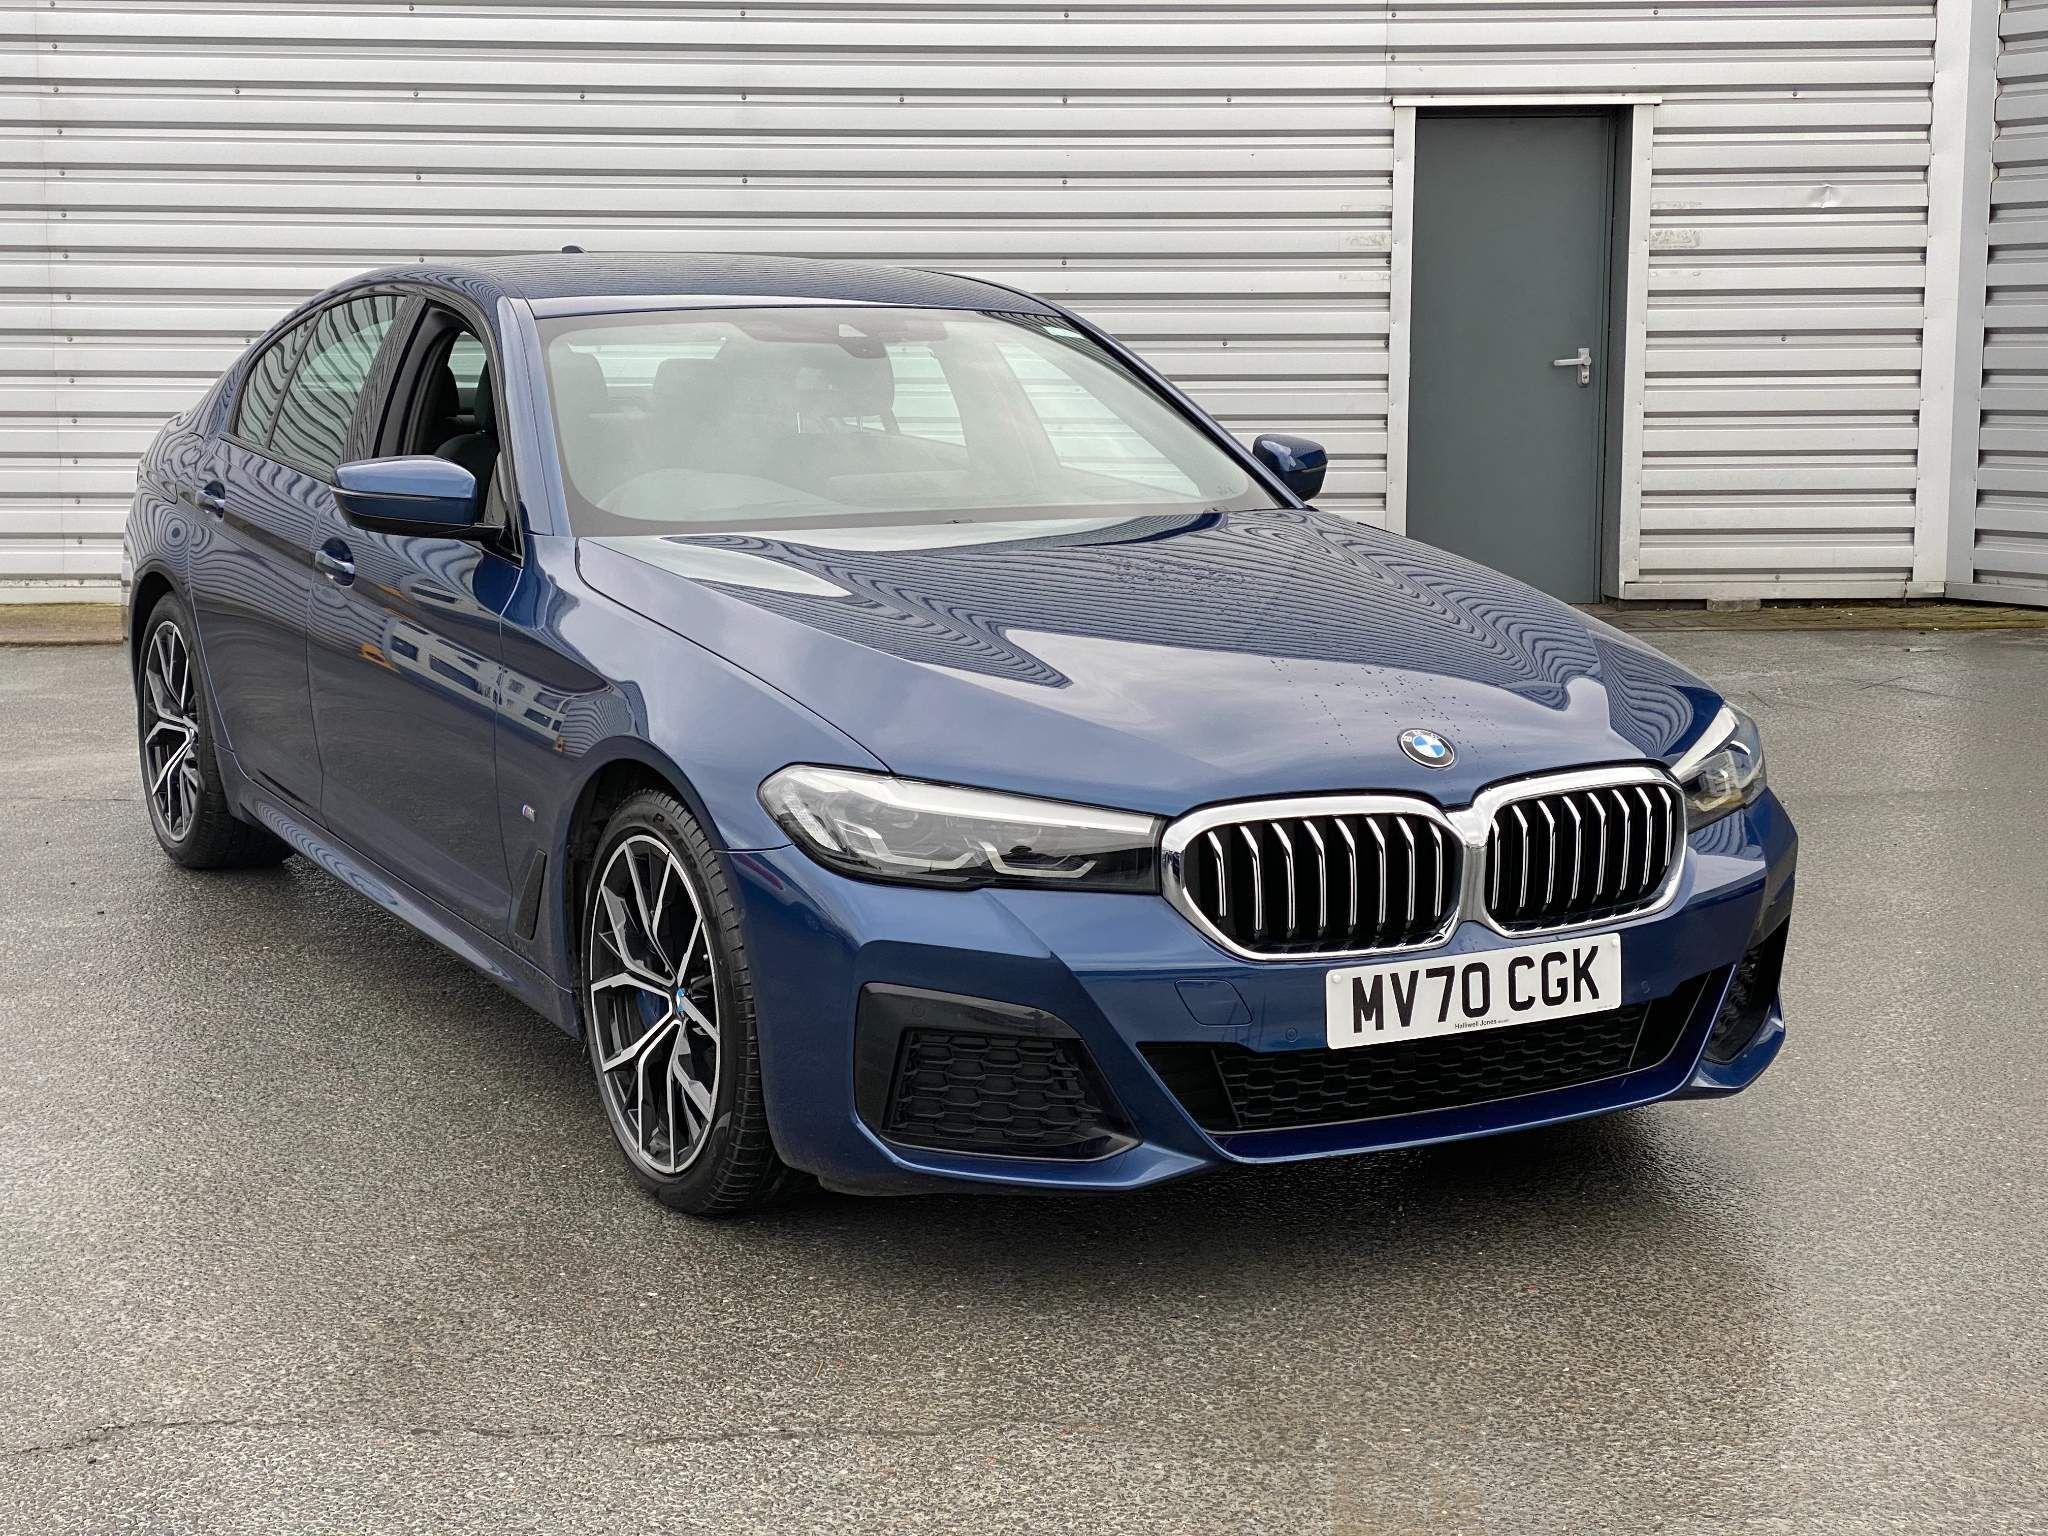 Image 1 - BMW 530d xDrive M Sport Saloon (MV70CGK)